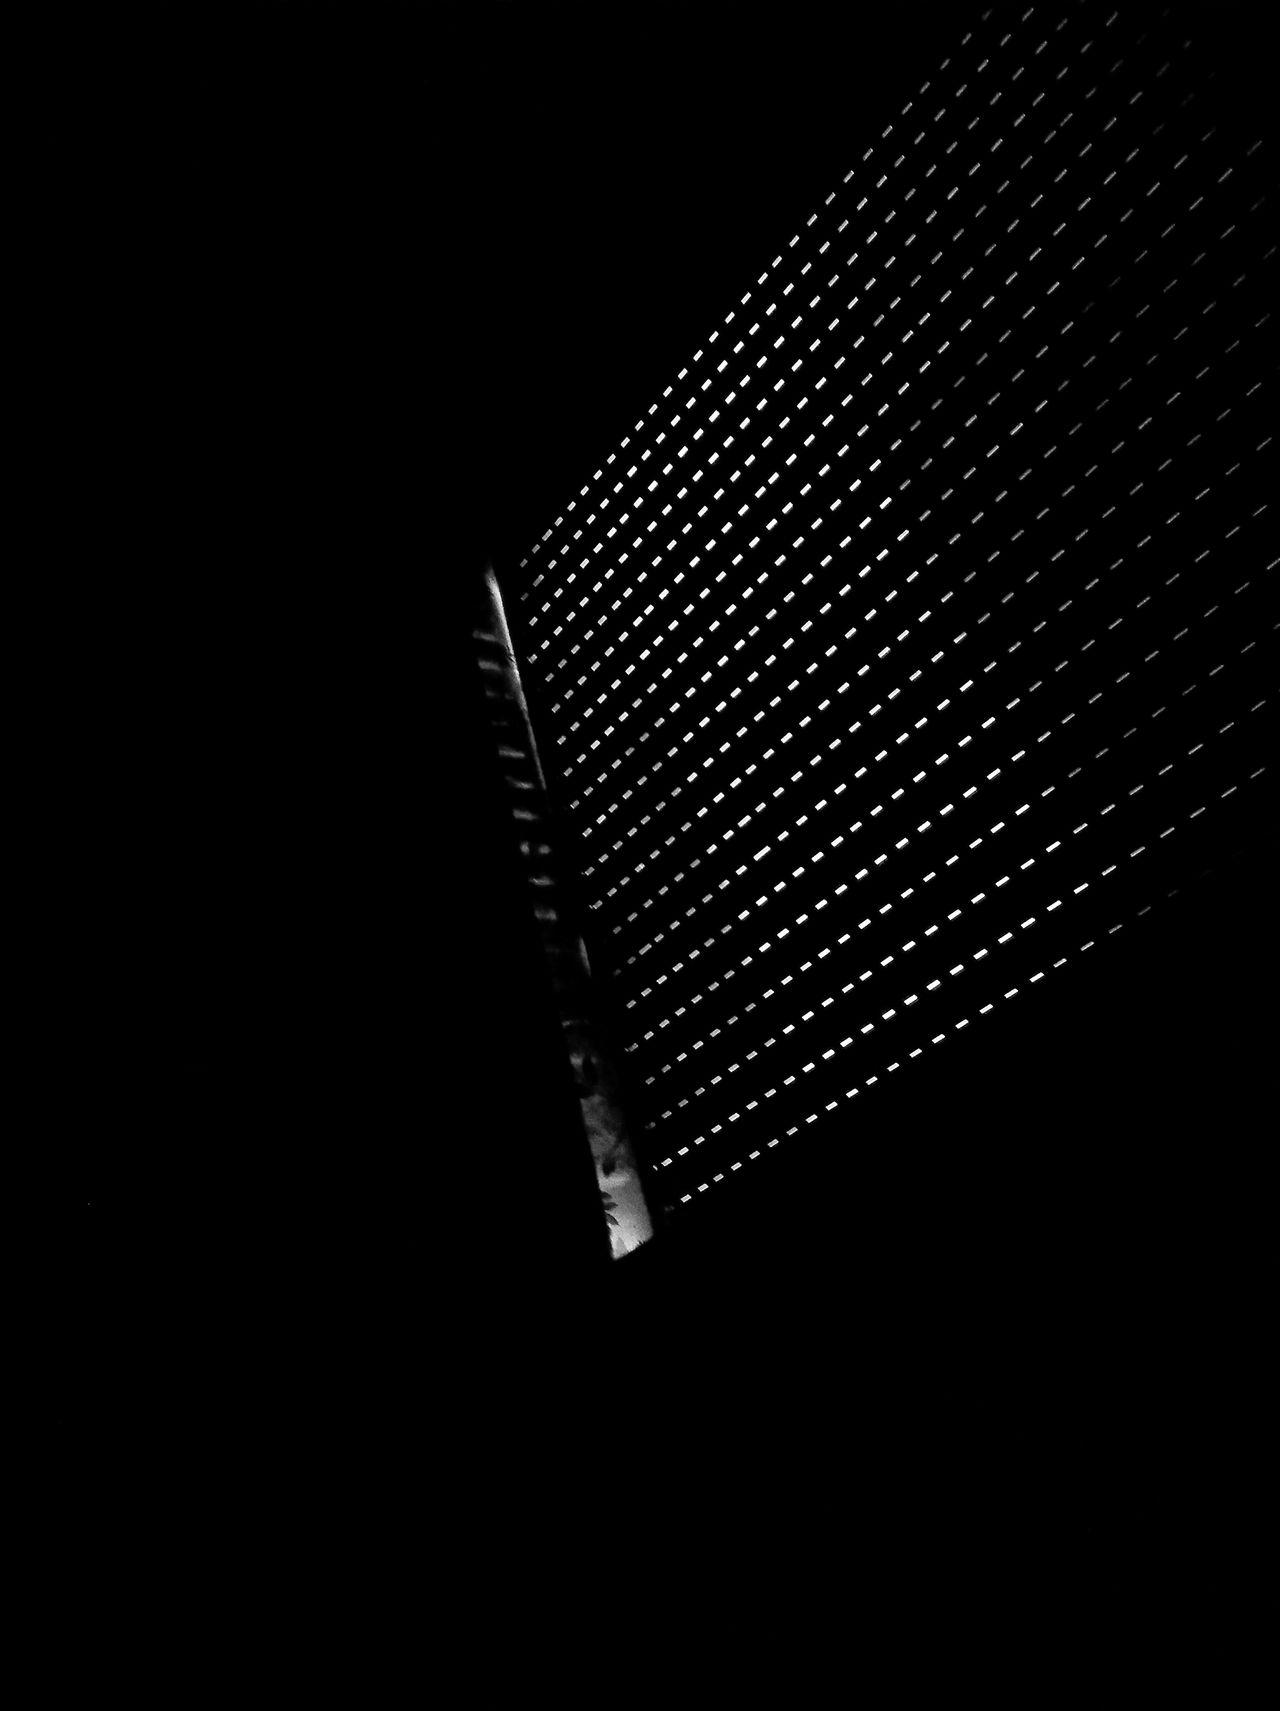 Ouch! The sun is already here ☀ night Low angle view Black Background pixelated Textured window Light light and shadow Blackout blackandwhite monochrome Shades Of Grey black vs white contrast MnM MnMl mnmlsm minimalism minimal minimalistic vampire Time to sleep minimalobsession minimalart